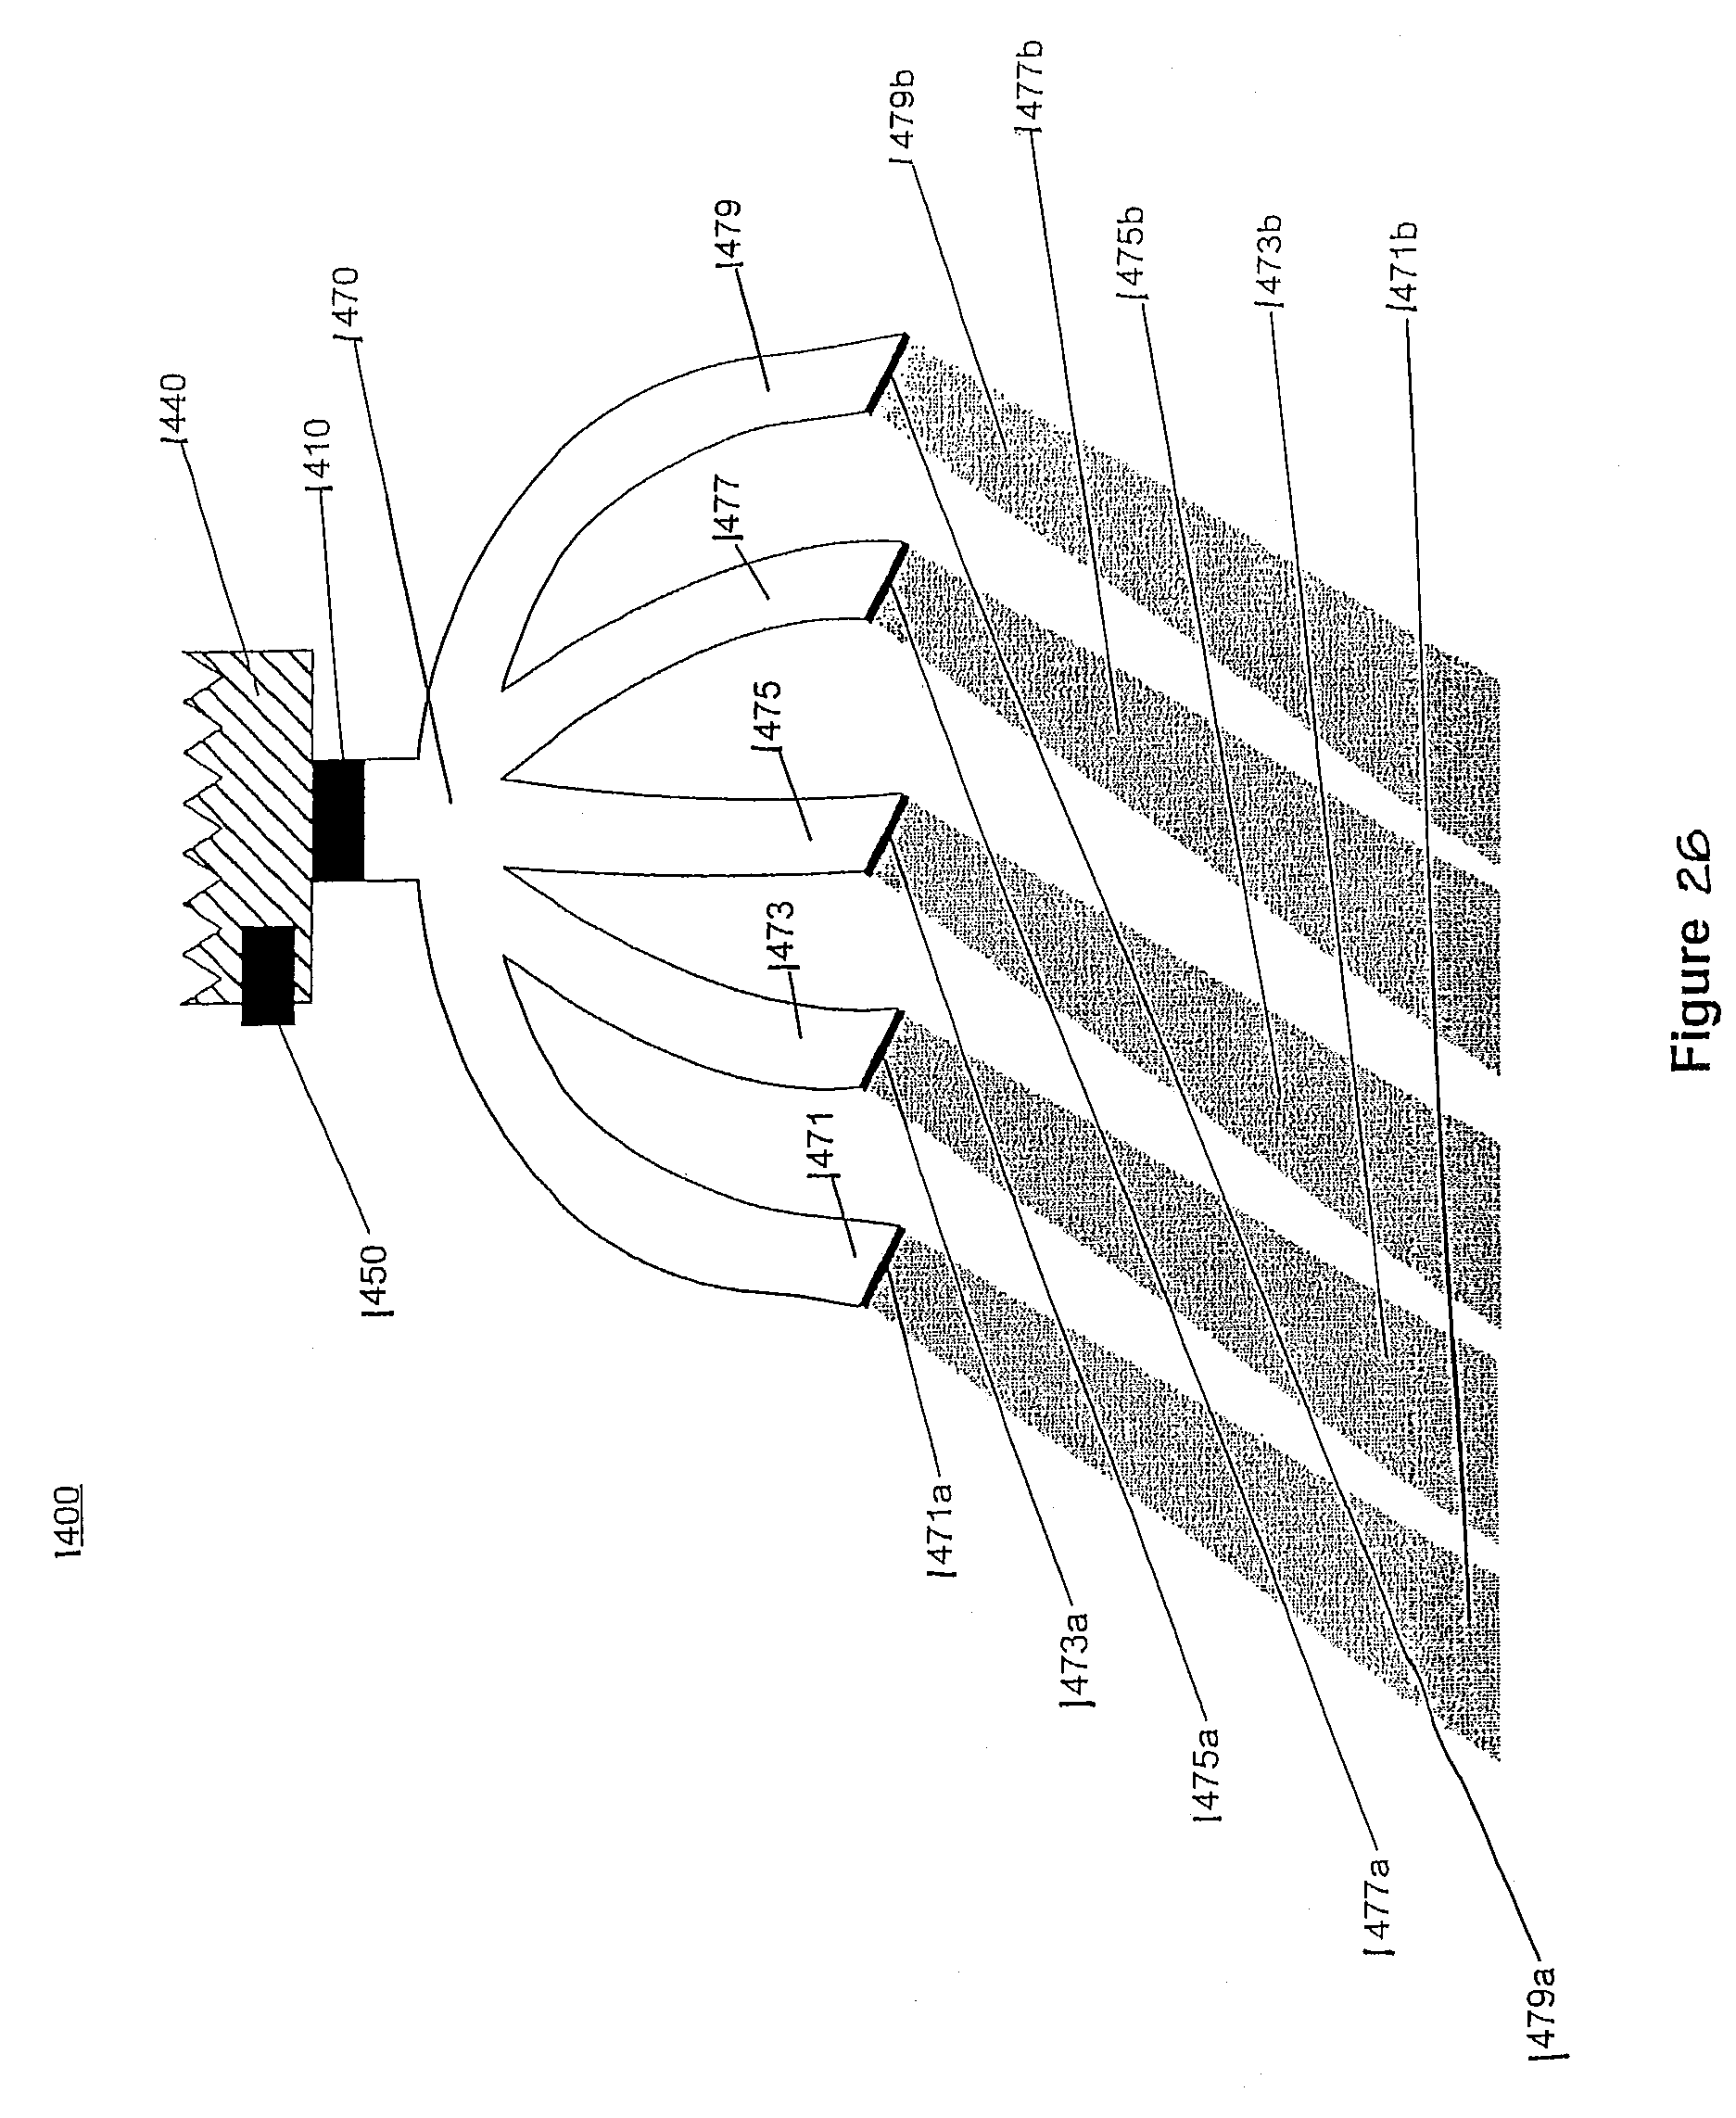 patent us 7 731 403 b2  patent images